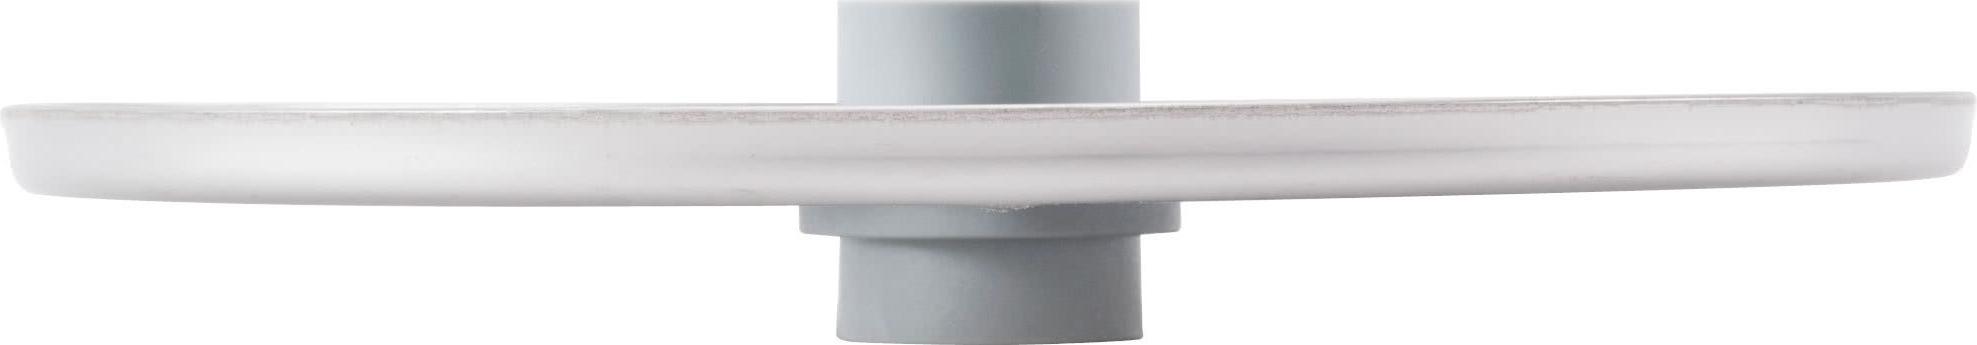 Диск-слайсер Robot Coupe 27555(2мм) - 3